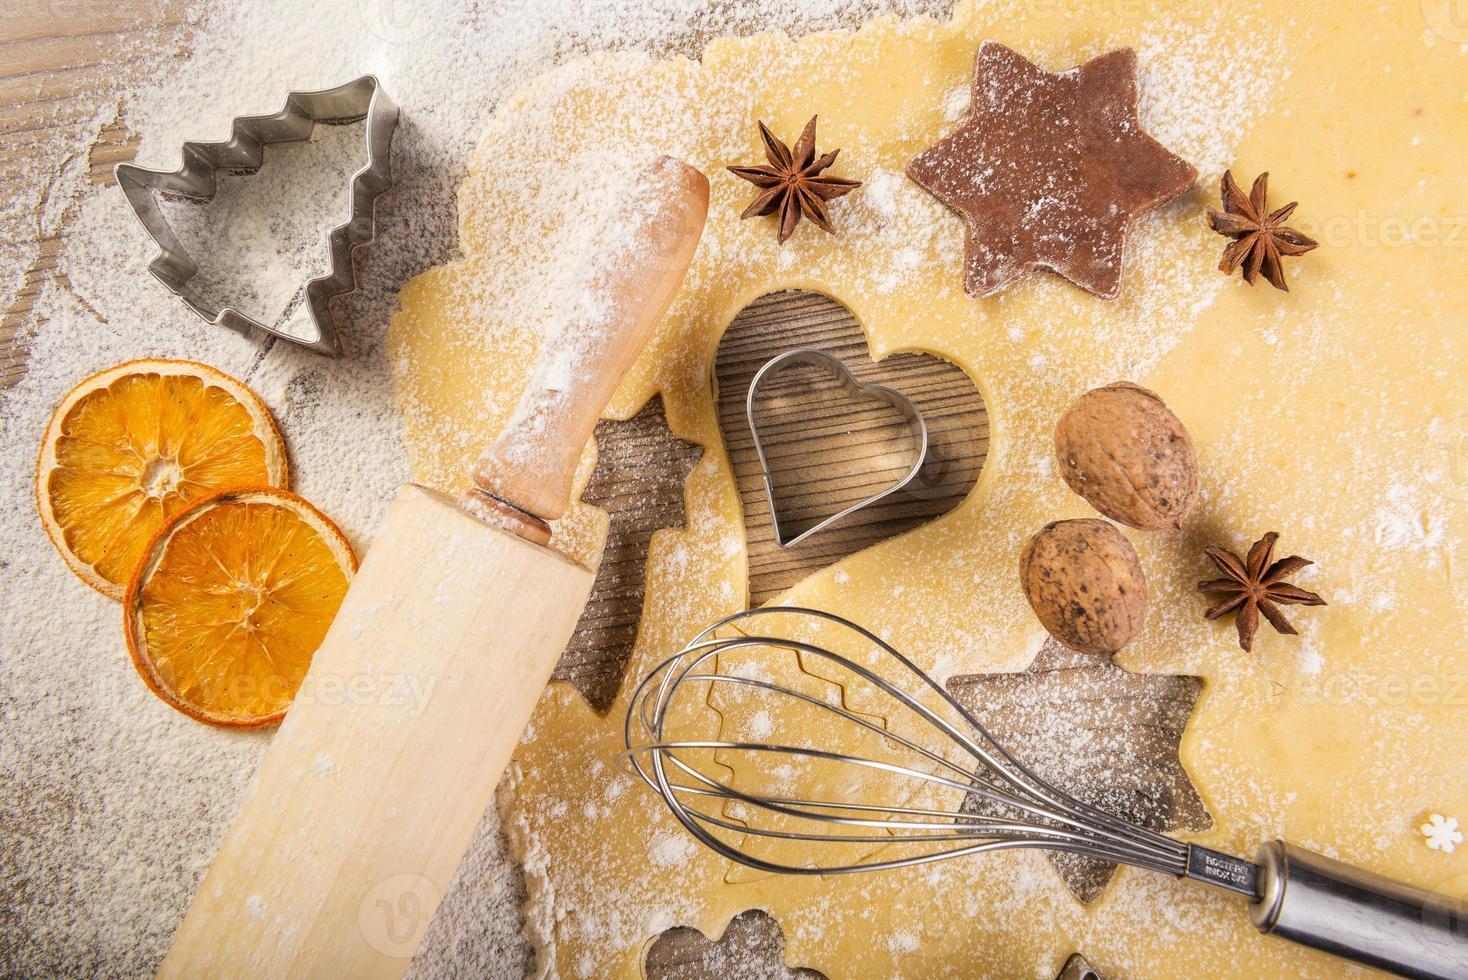 Christmas baking, cookies, rolling pin, mixer, photo